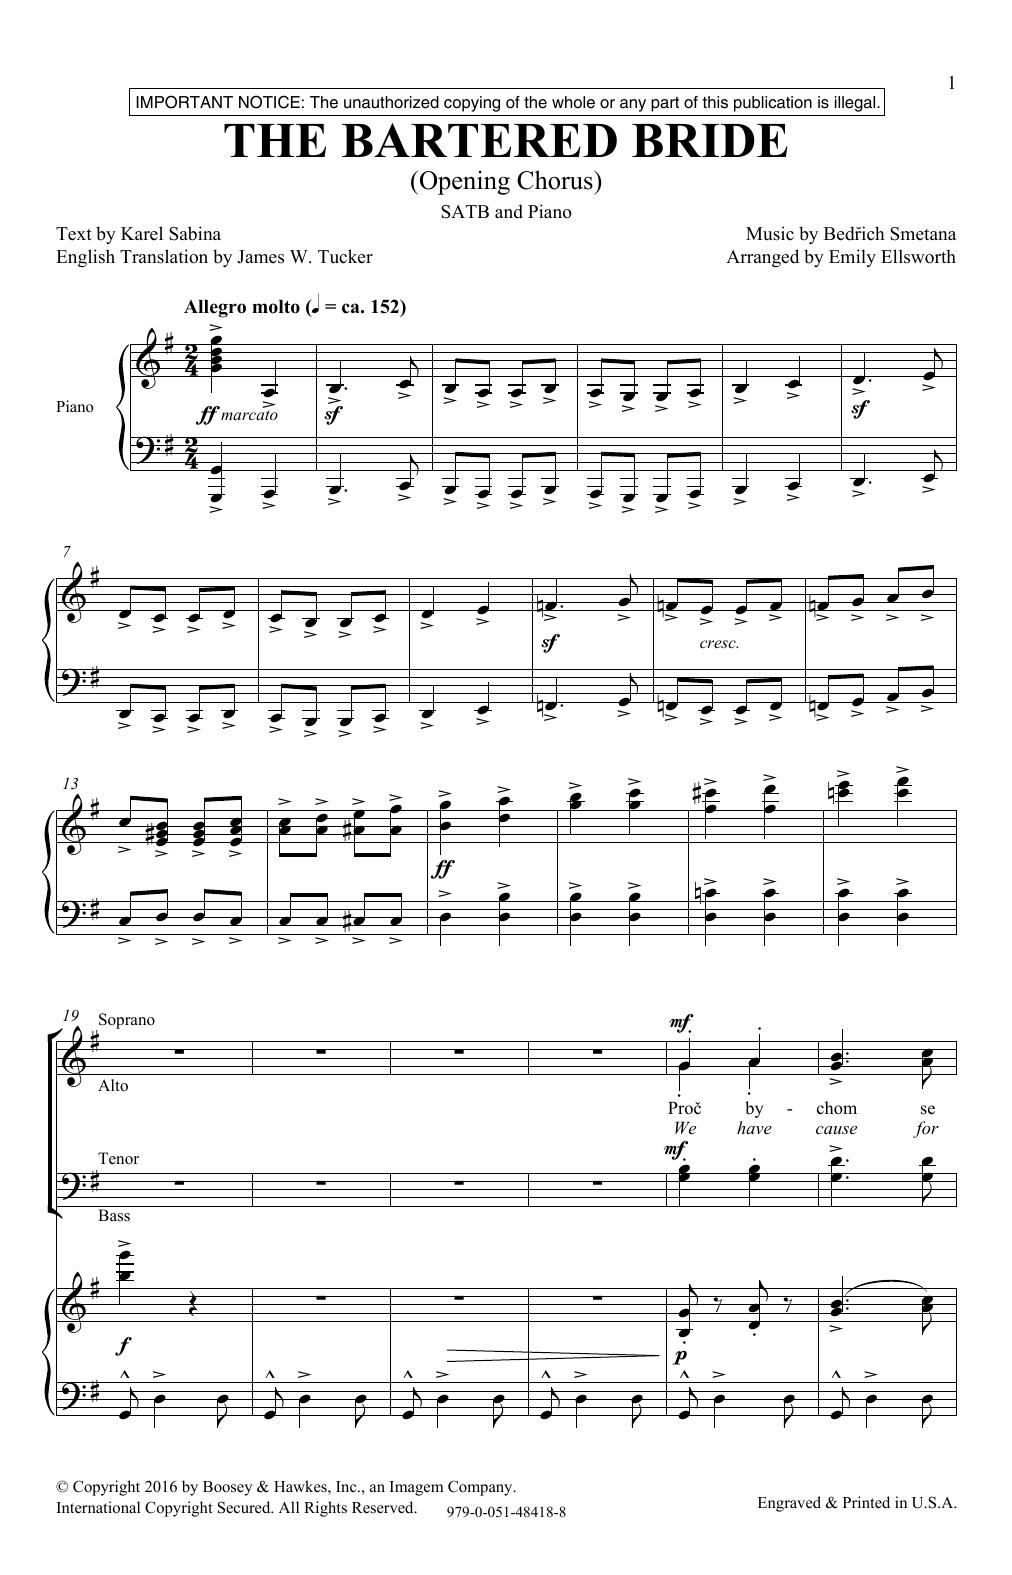 The Bartered Bride (SATB Choir)